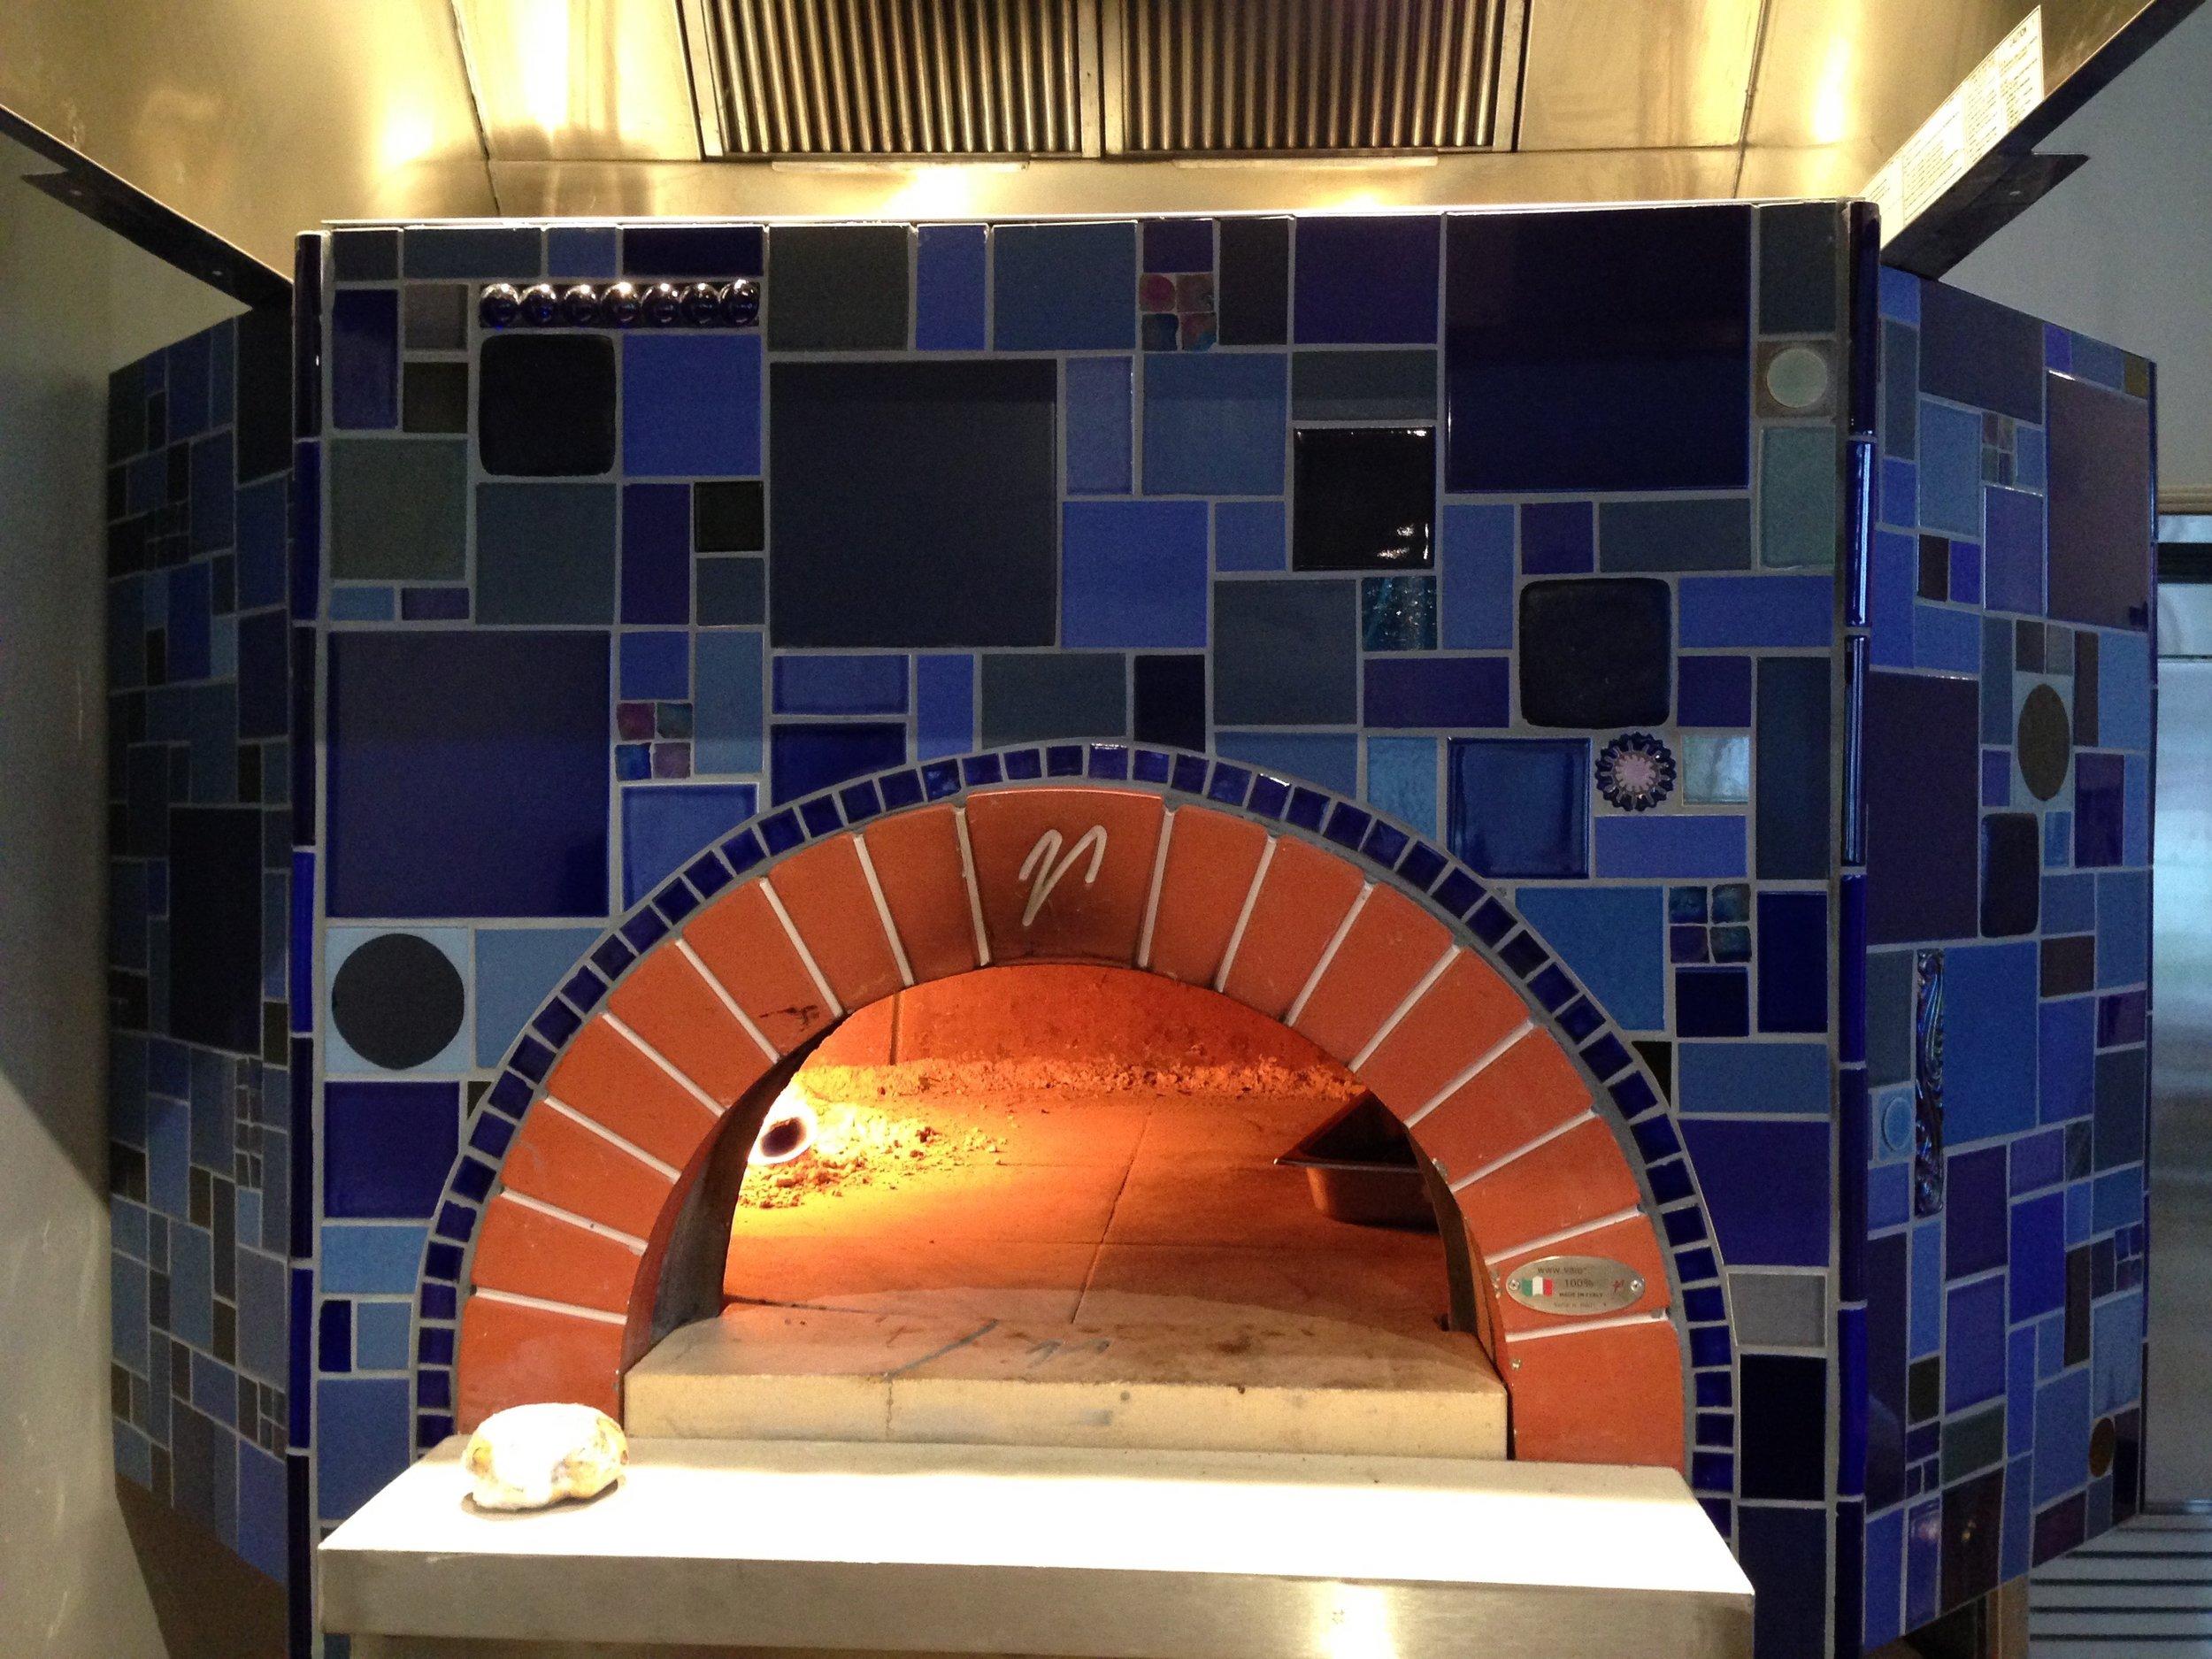 Millville Pizza Oven, Summers & Edelstein